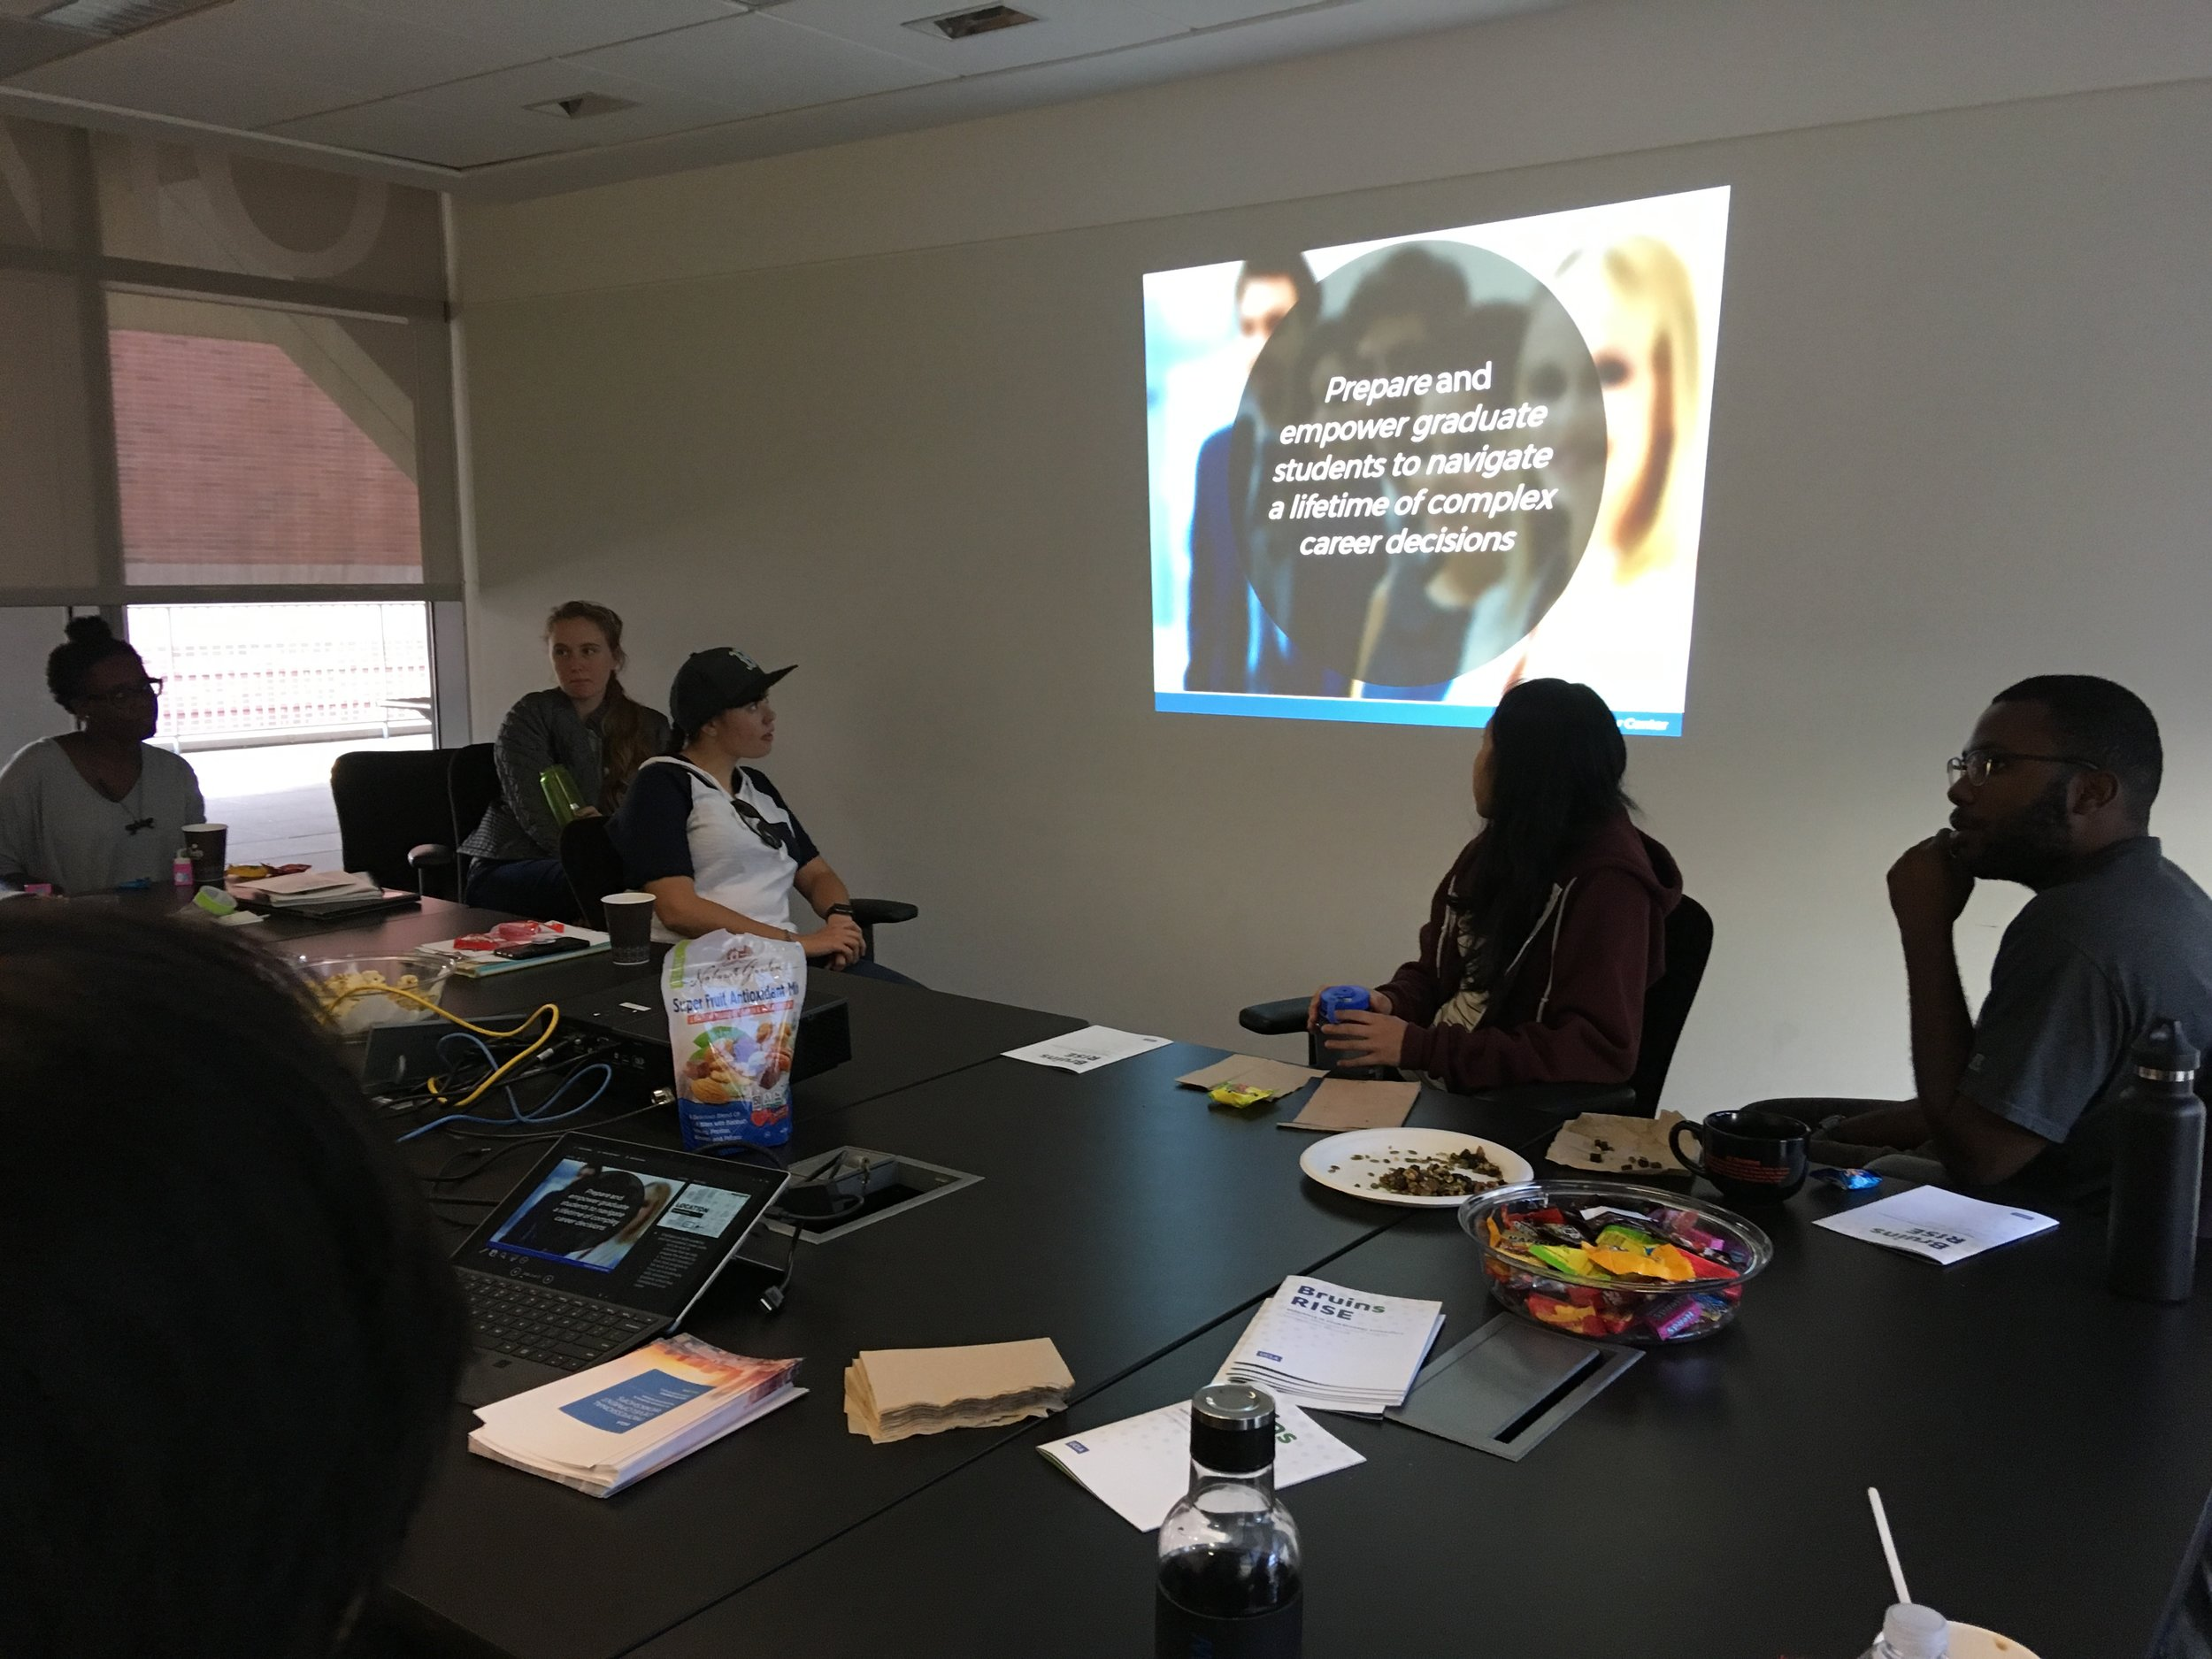 October 11, 2018: Brown Bag Seminar on UCLA Career Center Services